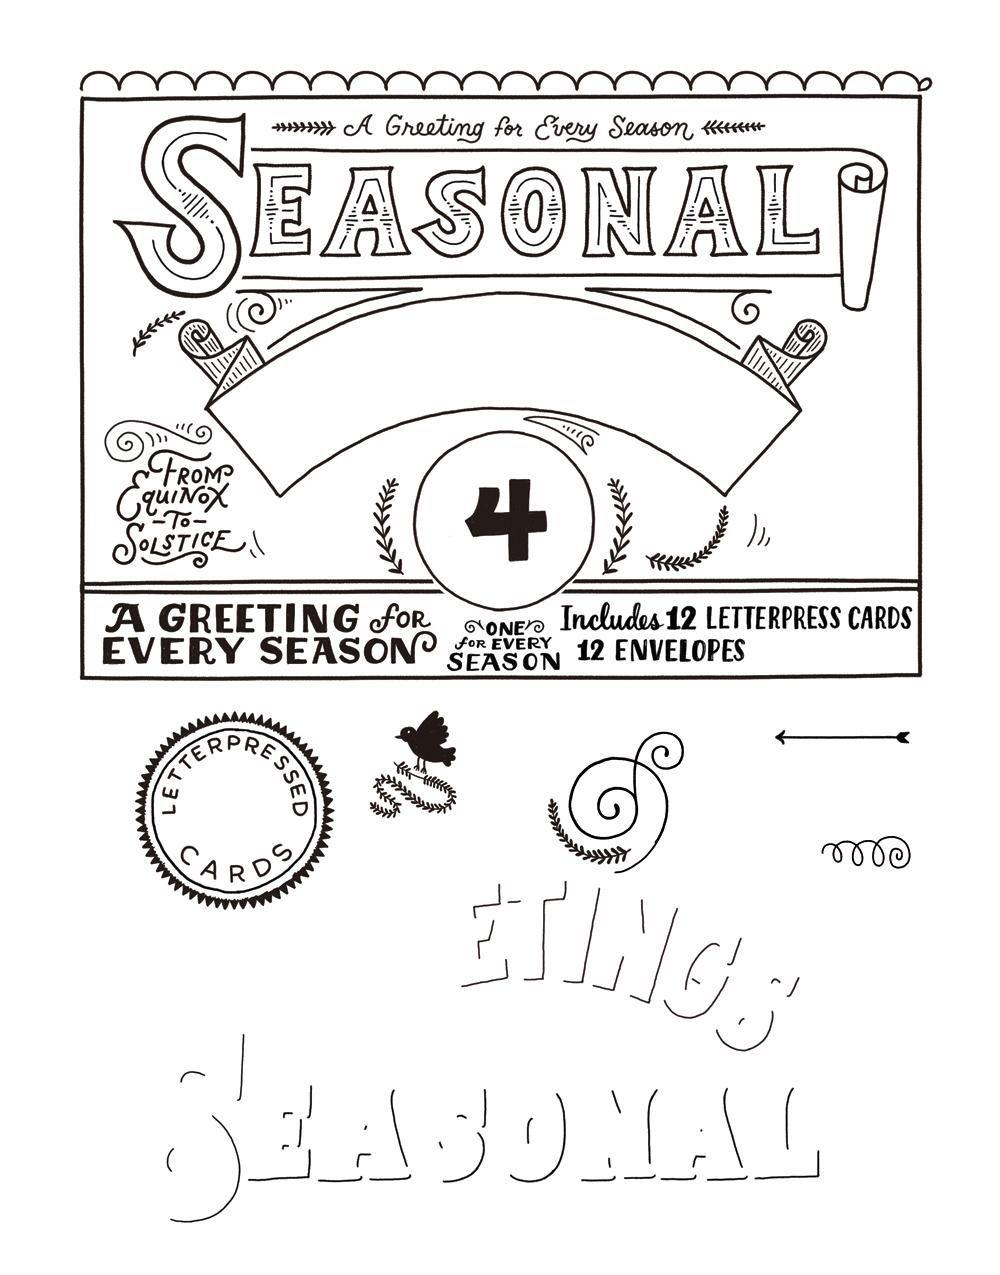 Seasonal Greetings Box - image 16 - student project